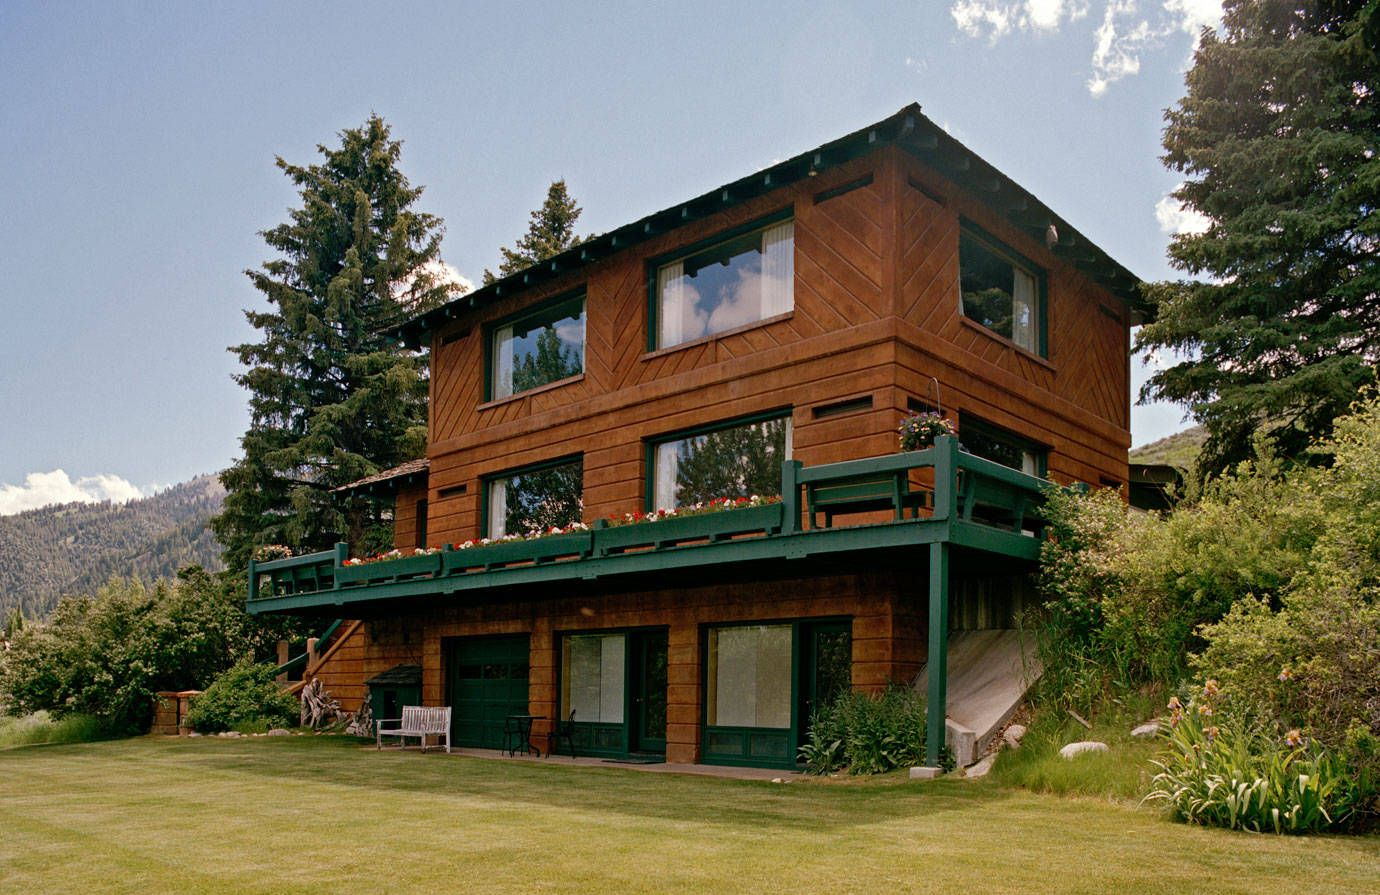 Ernest Hemingway House Ketchum Idaho Photos - Pictures of Mariel Hemingway and Langley Fox